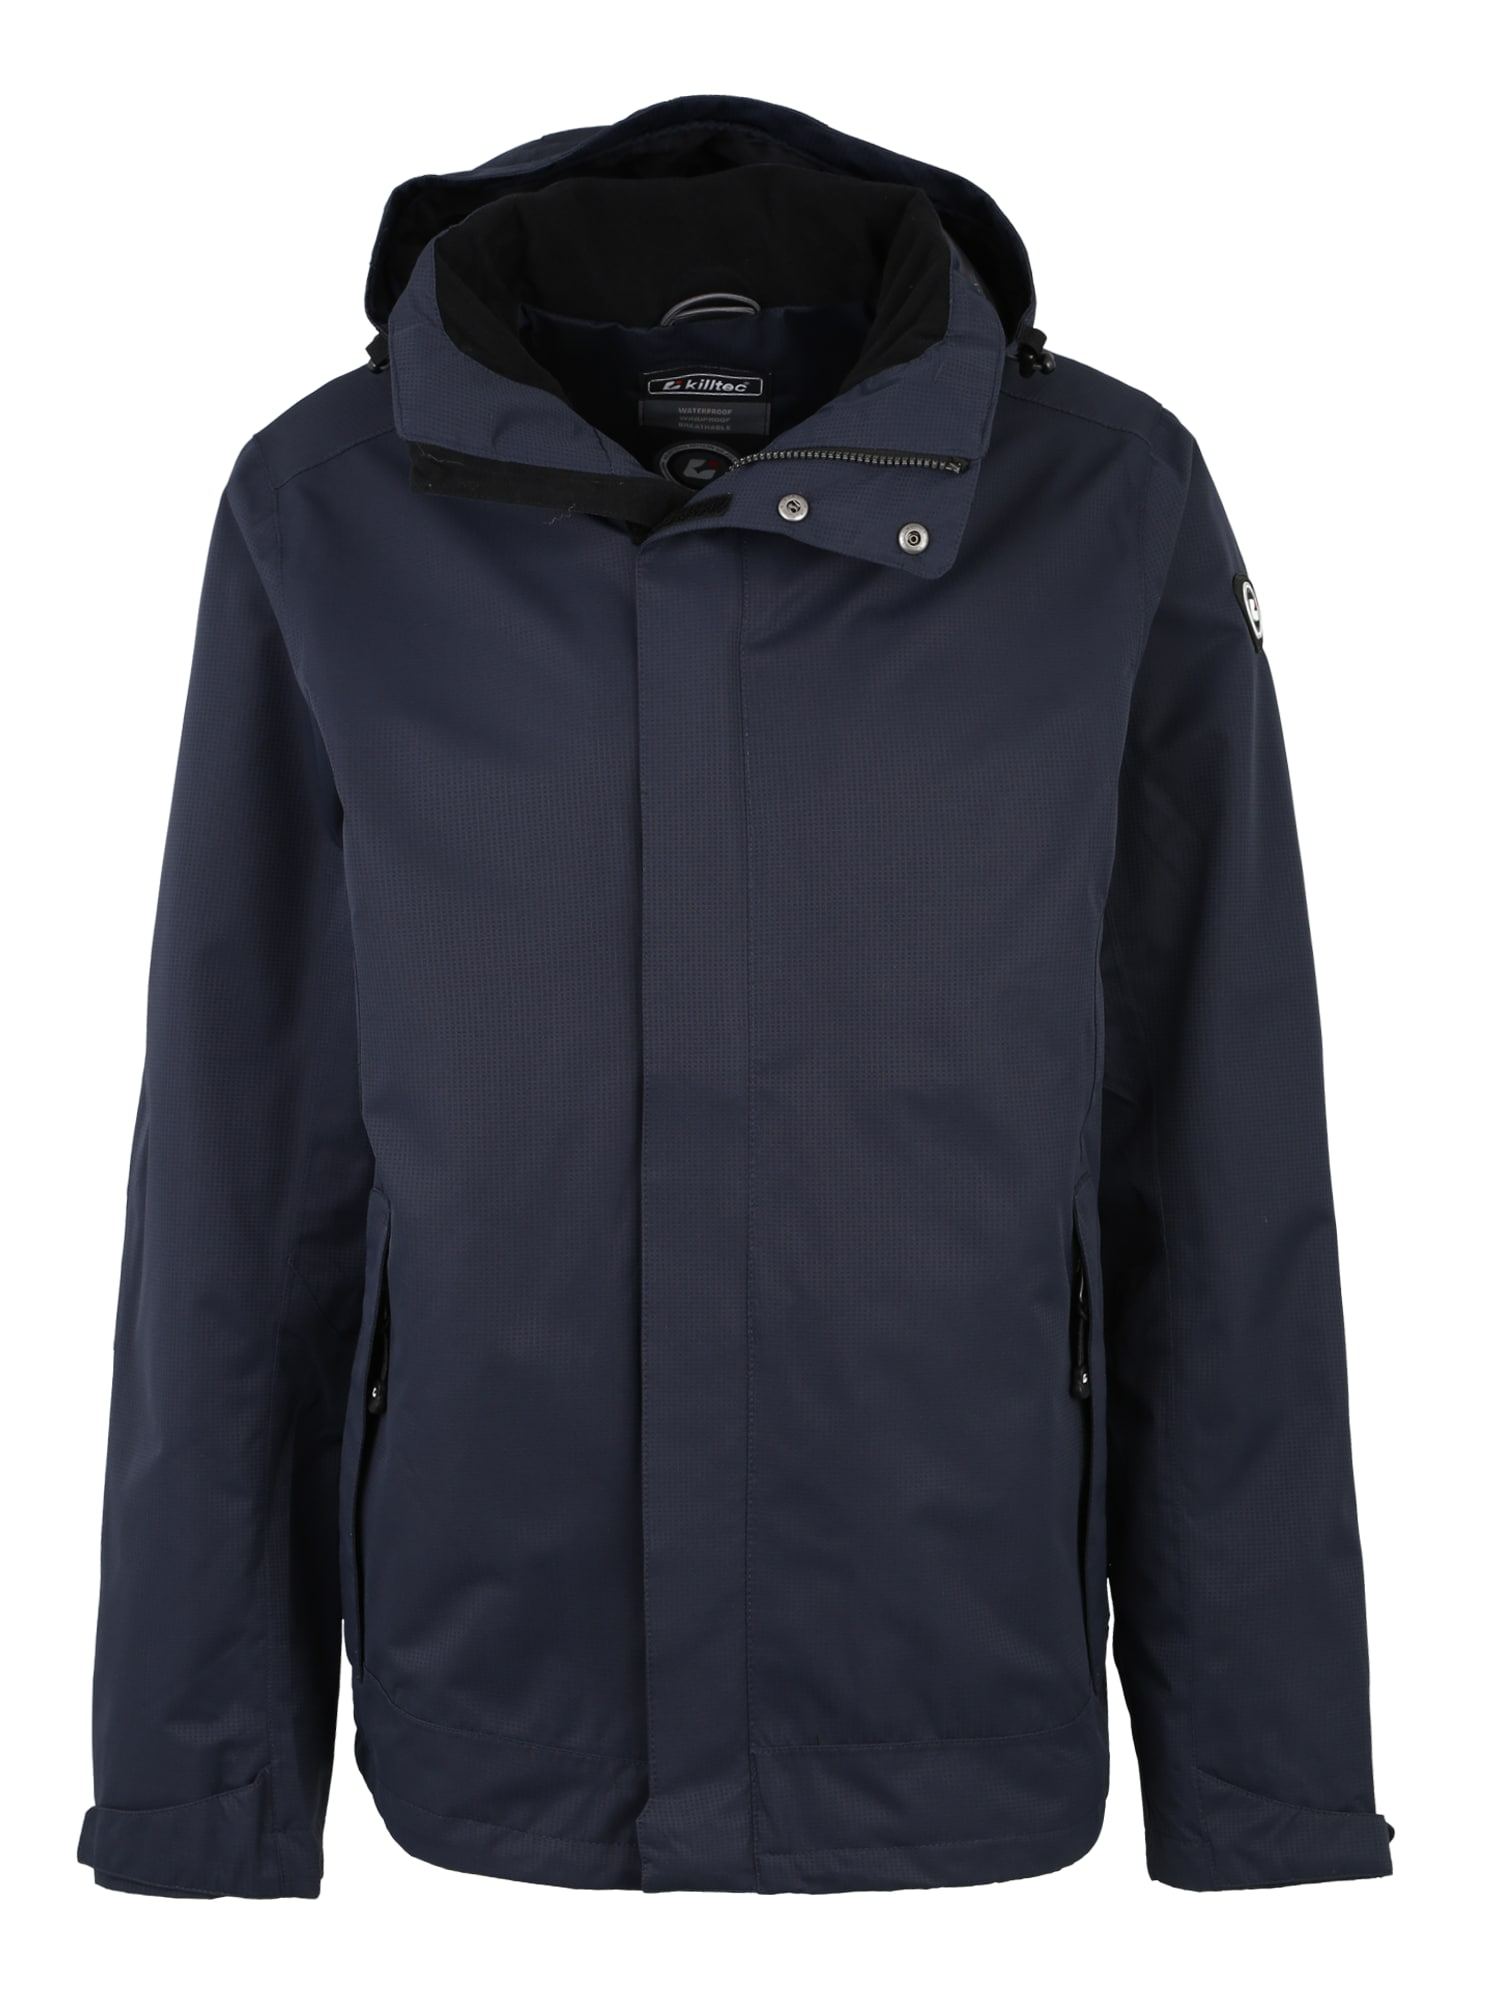 Outdoorová bunda Xenios tmavě modrá KILLTEC